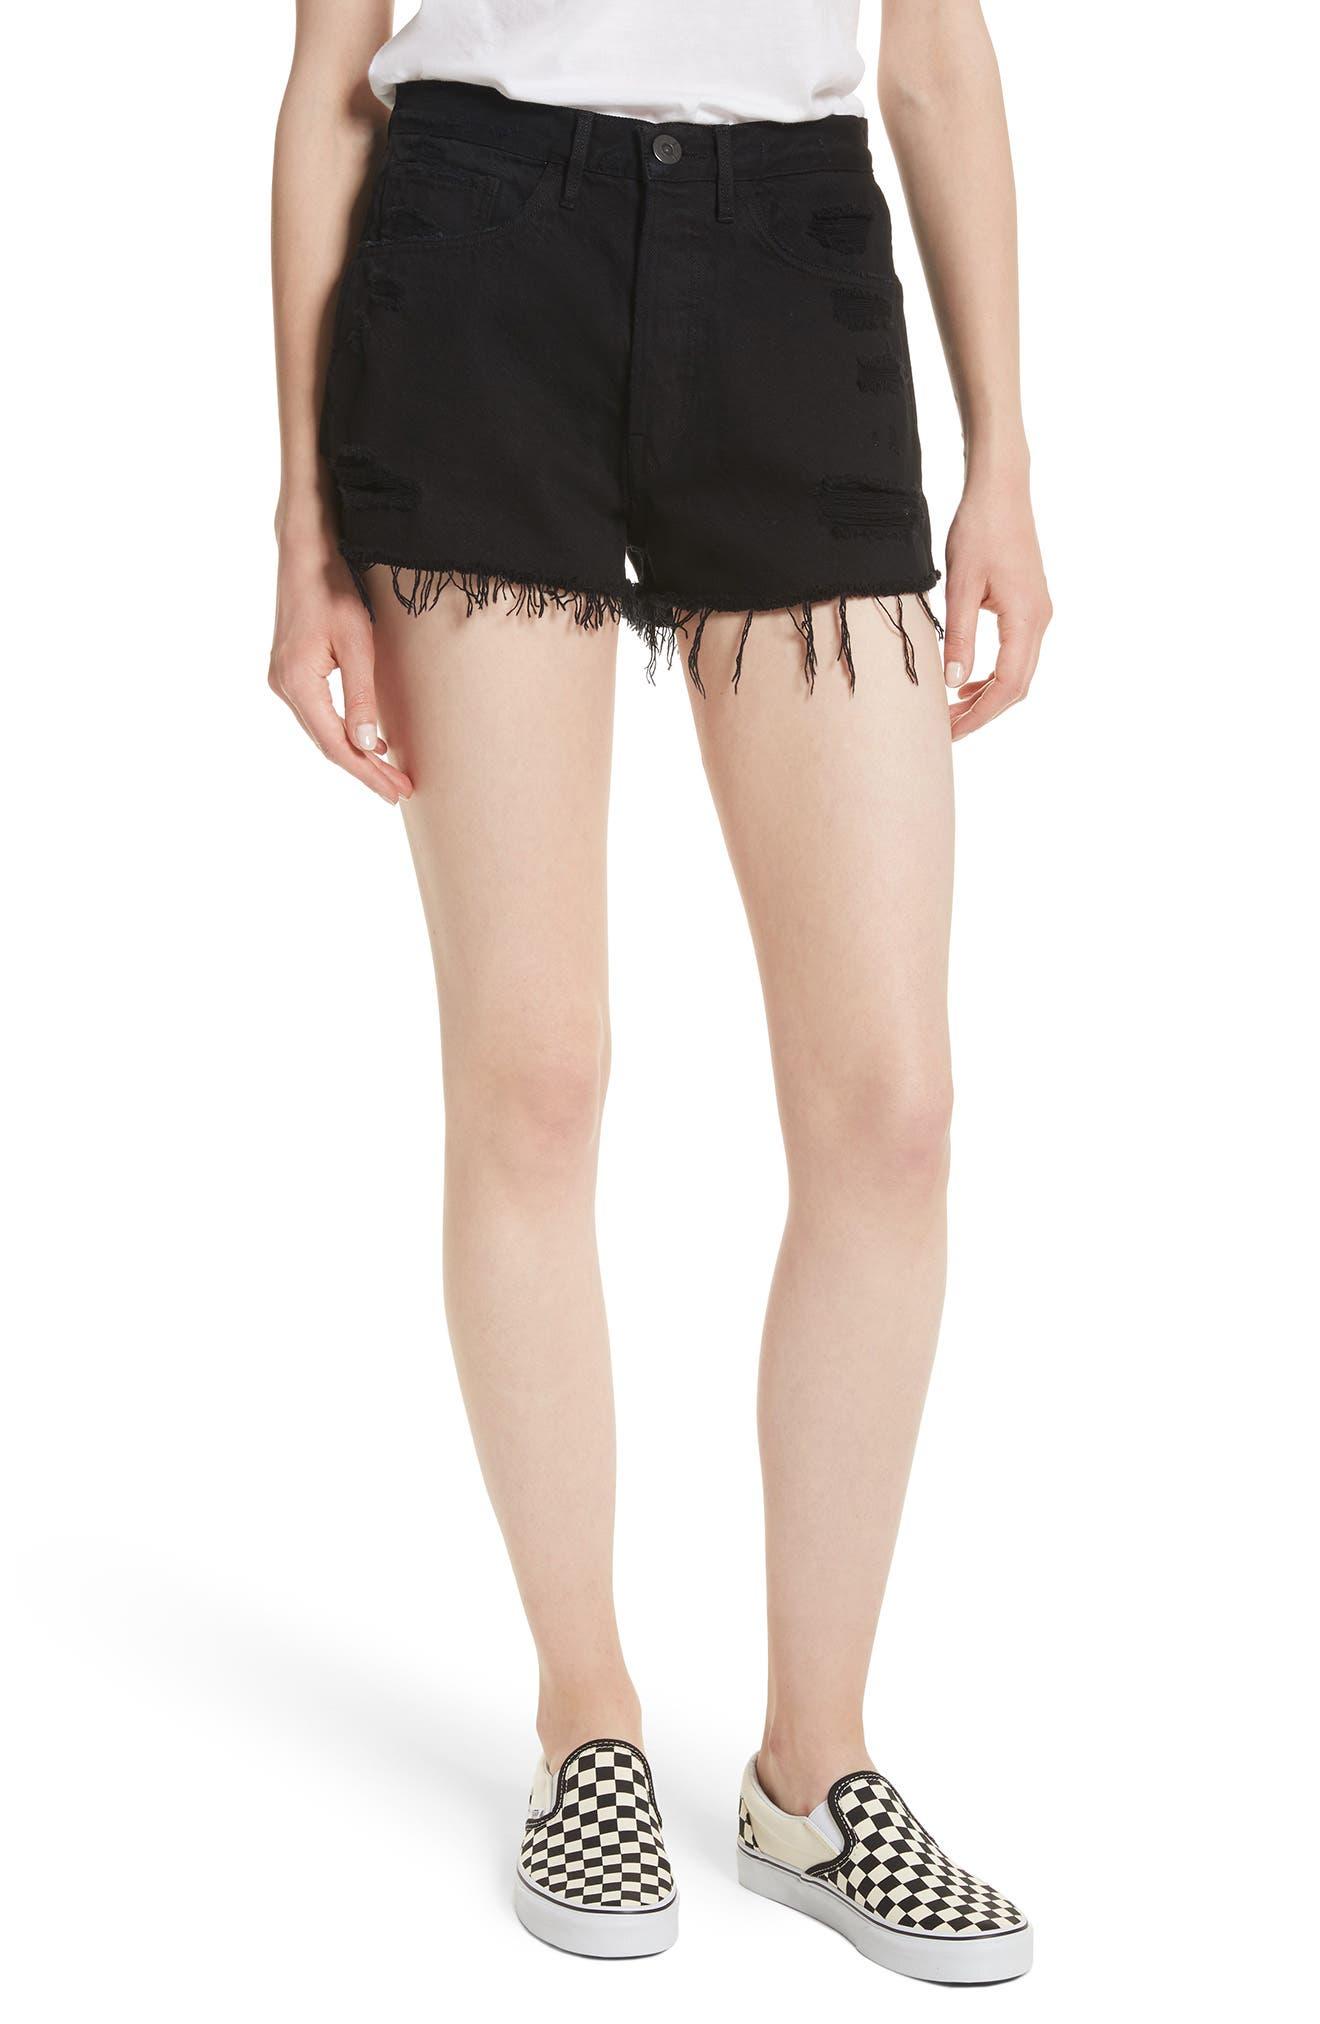 W4 Carter Ripped High Waist Denim Shorts,                         Main,                         color, Carbon